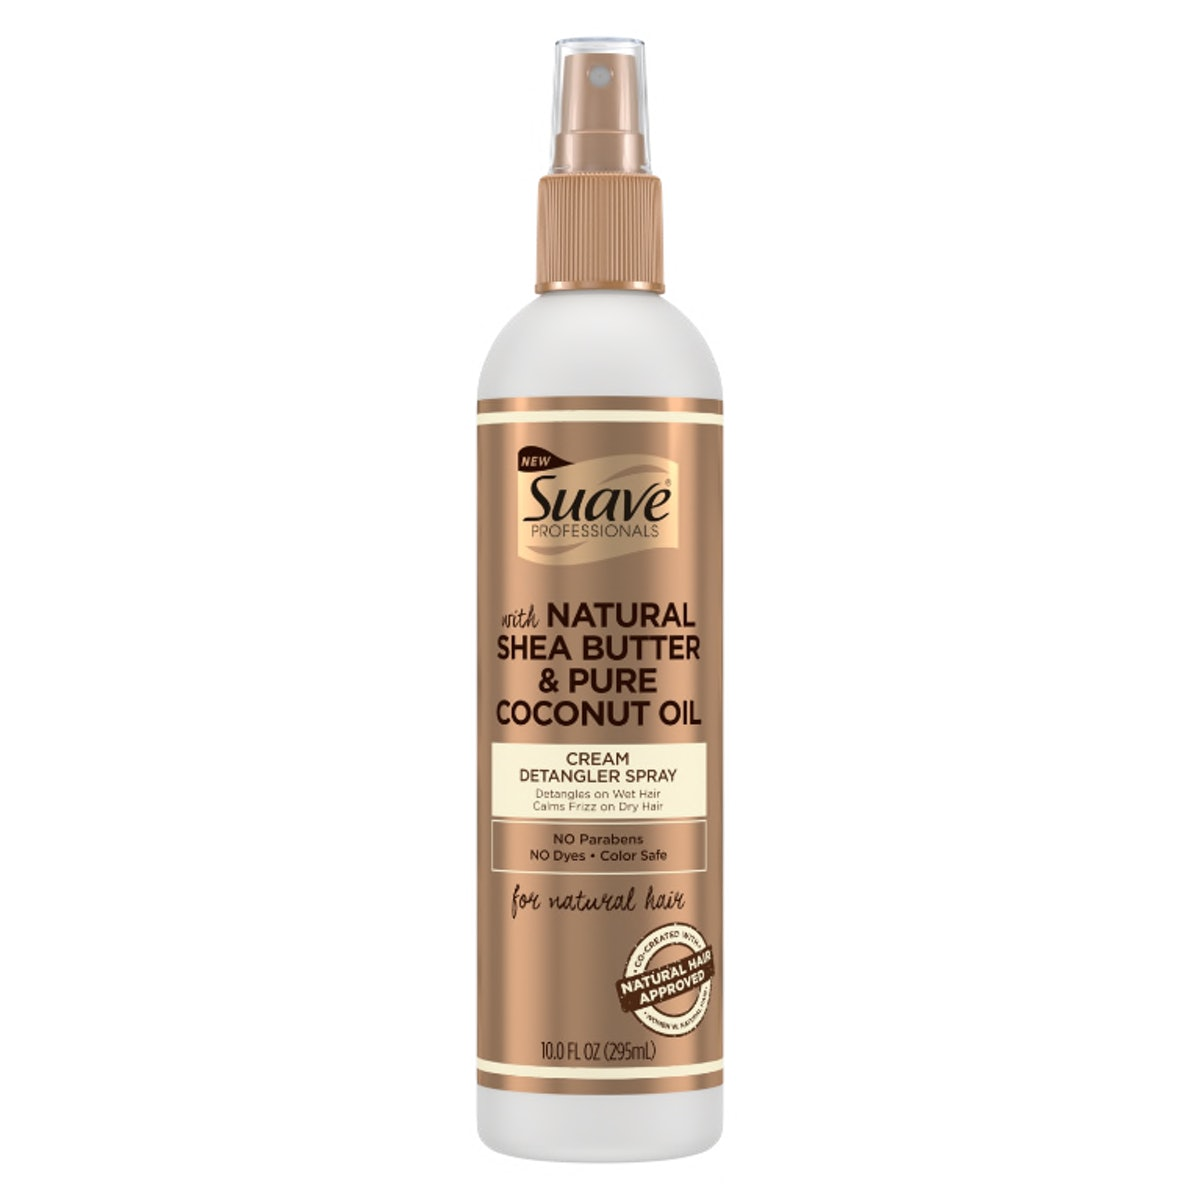 Suave Professionals for Natural Hair Cream Detangler Spray